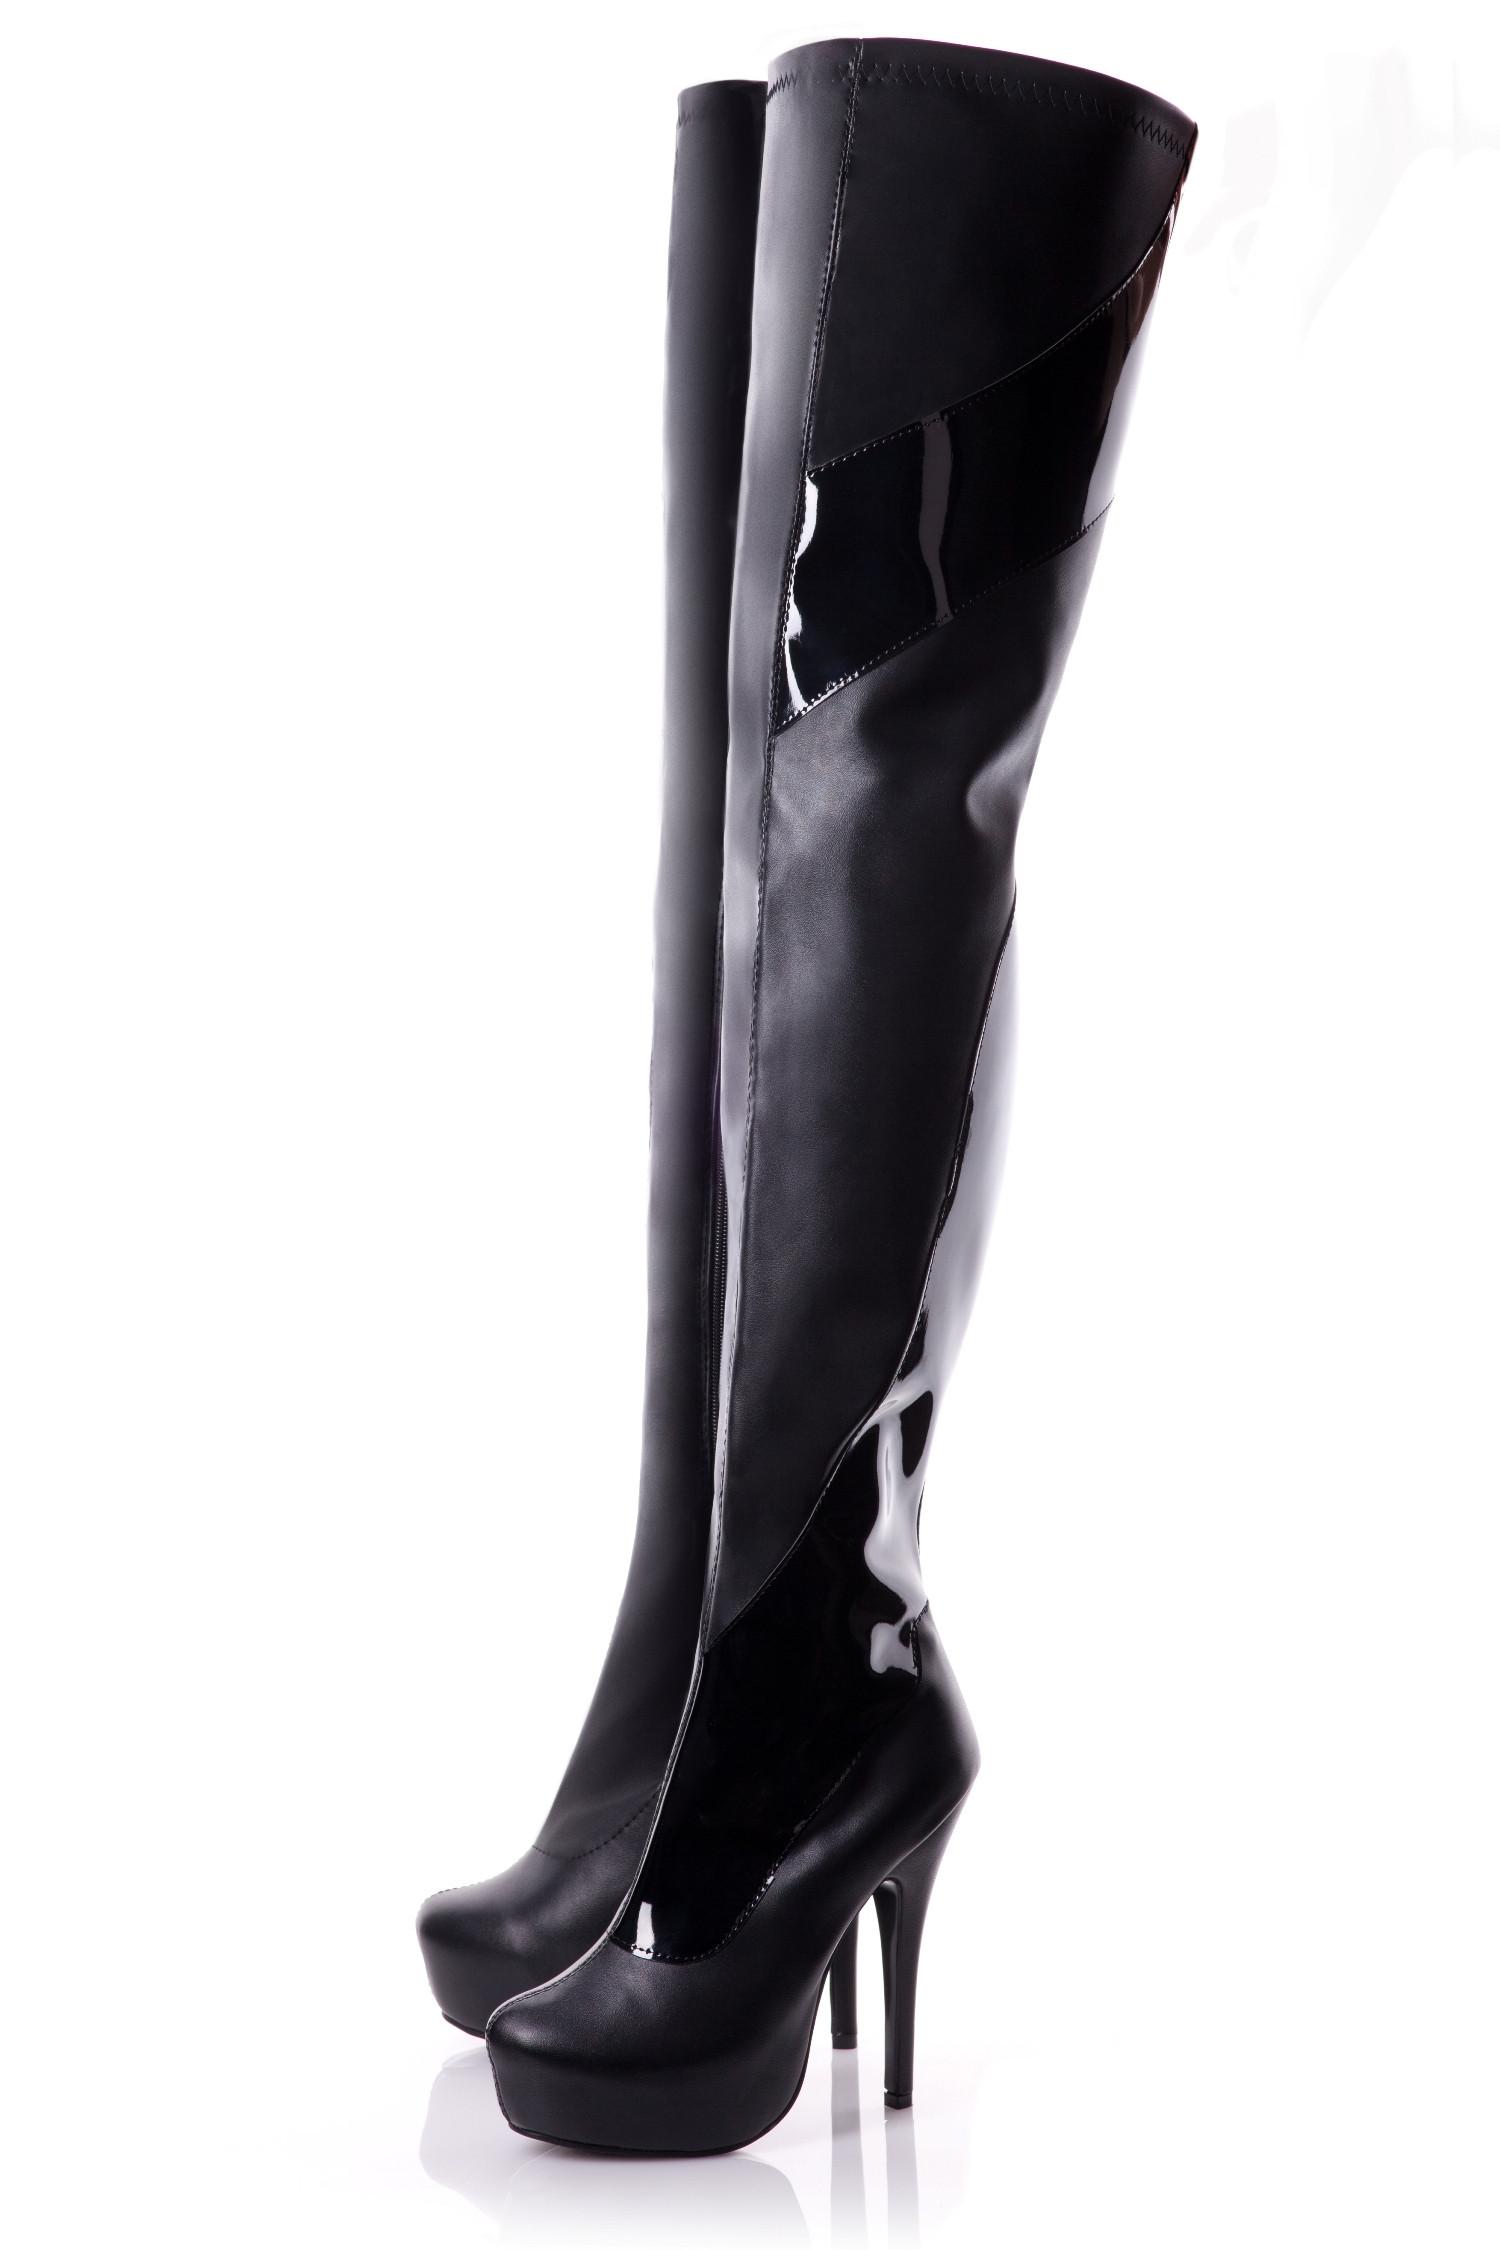 Crotch High Black Matt Boots With Patent Detail